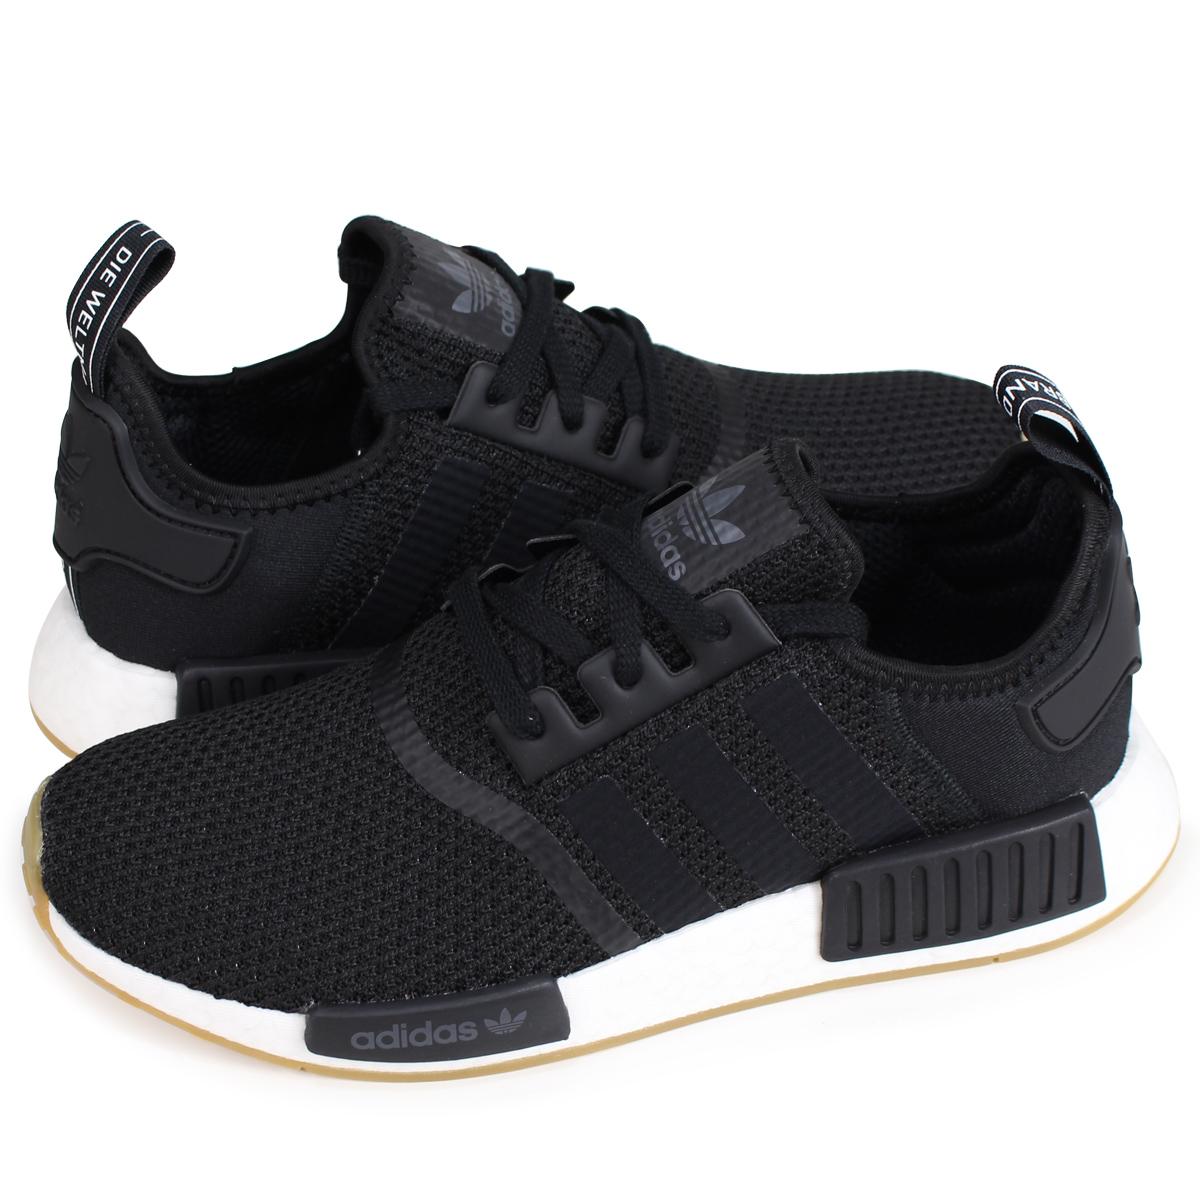 competitive price ed6c2 ccaea adidas Originals NMD R1 Adidas originals sneakers N M D nomad men B42200  black [7/7 Shinnyu load]